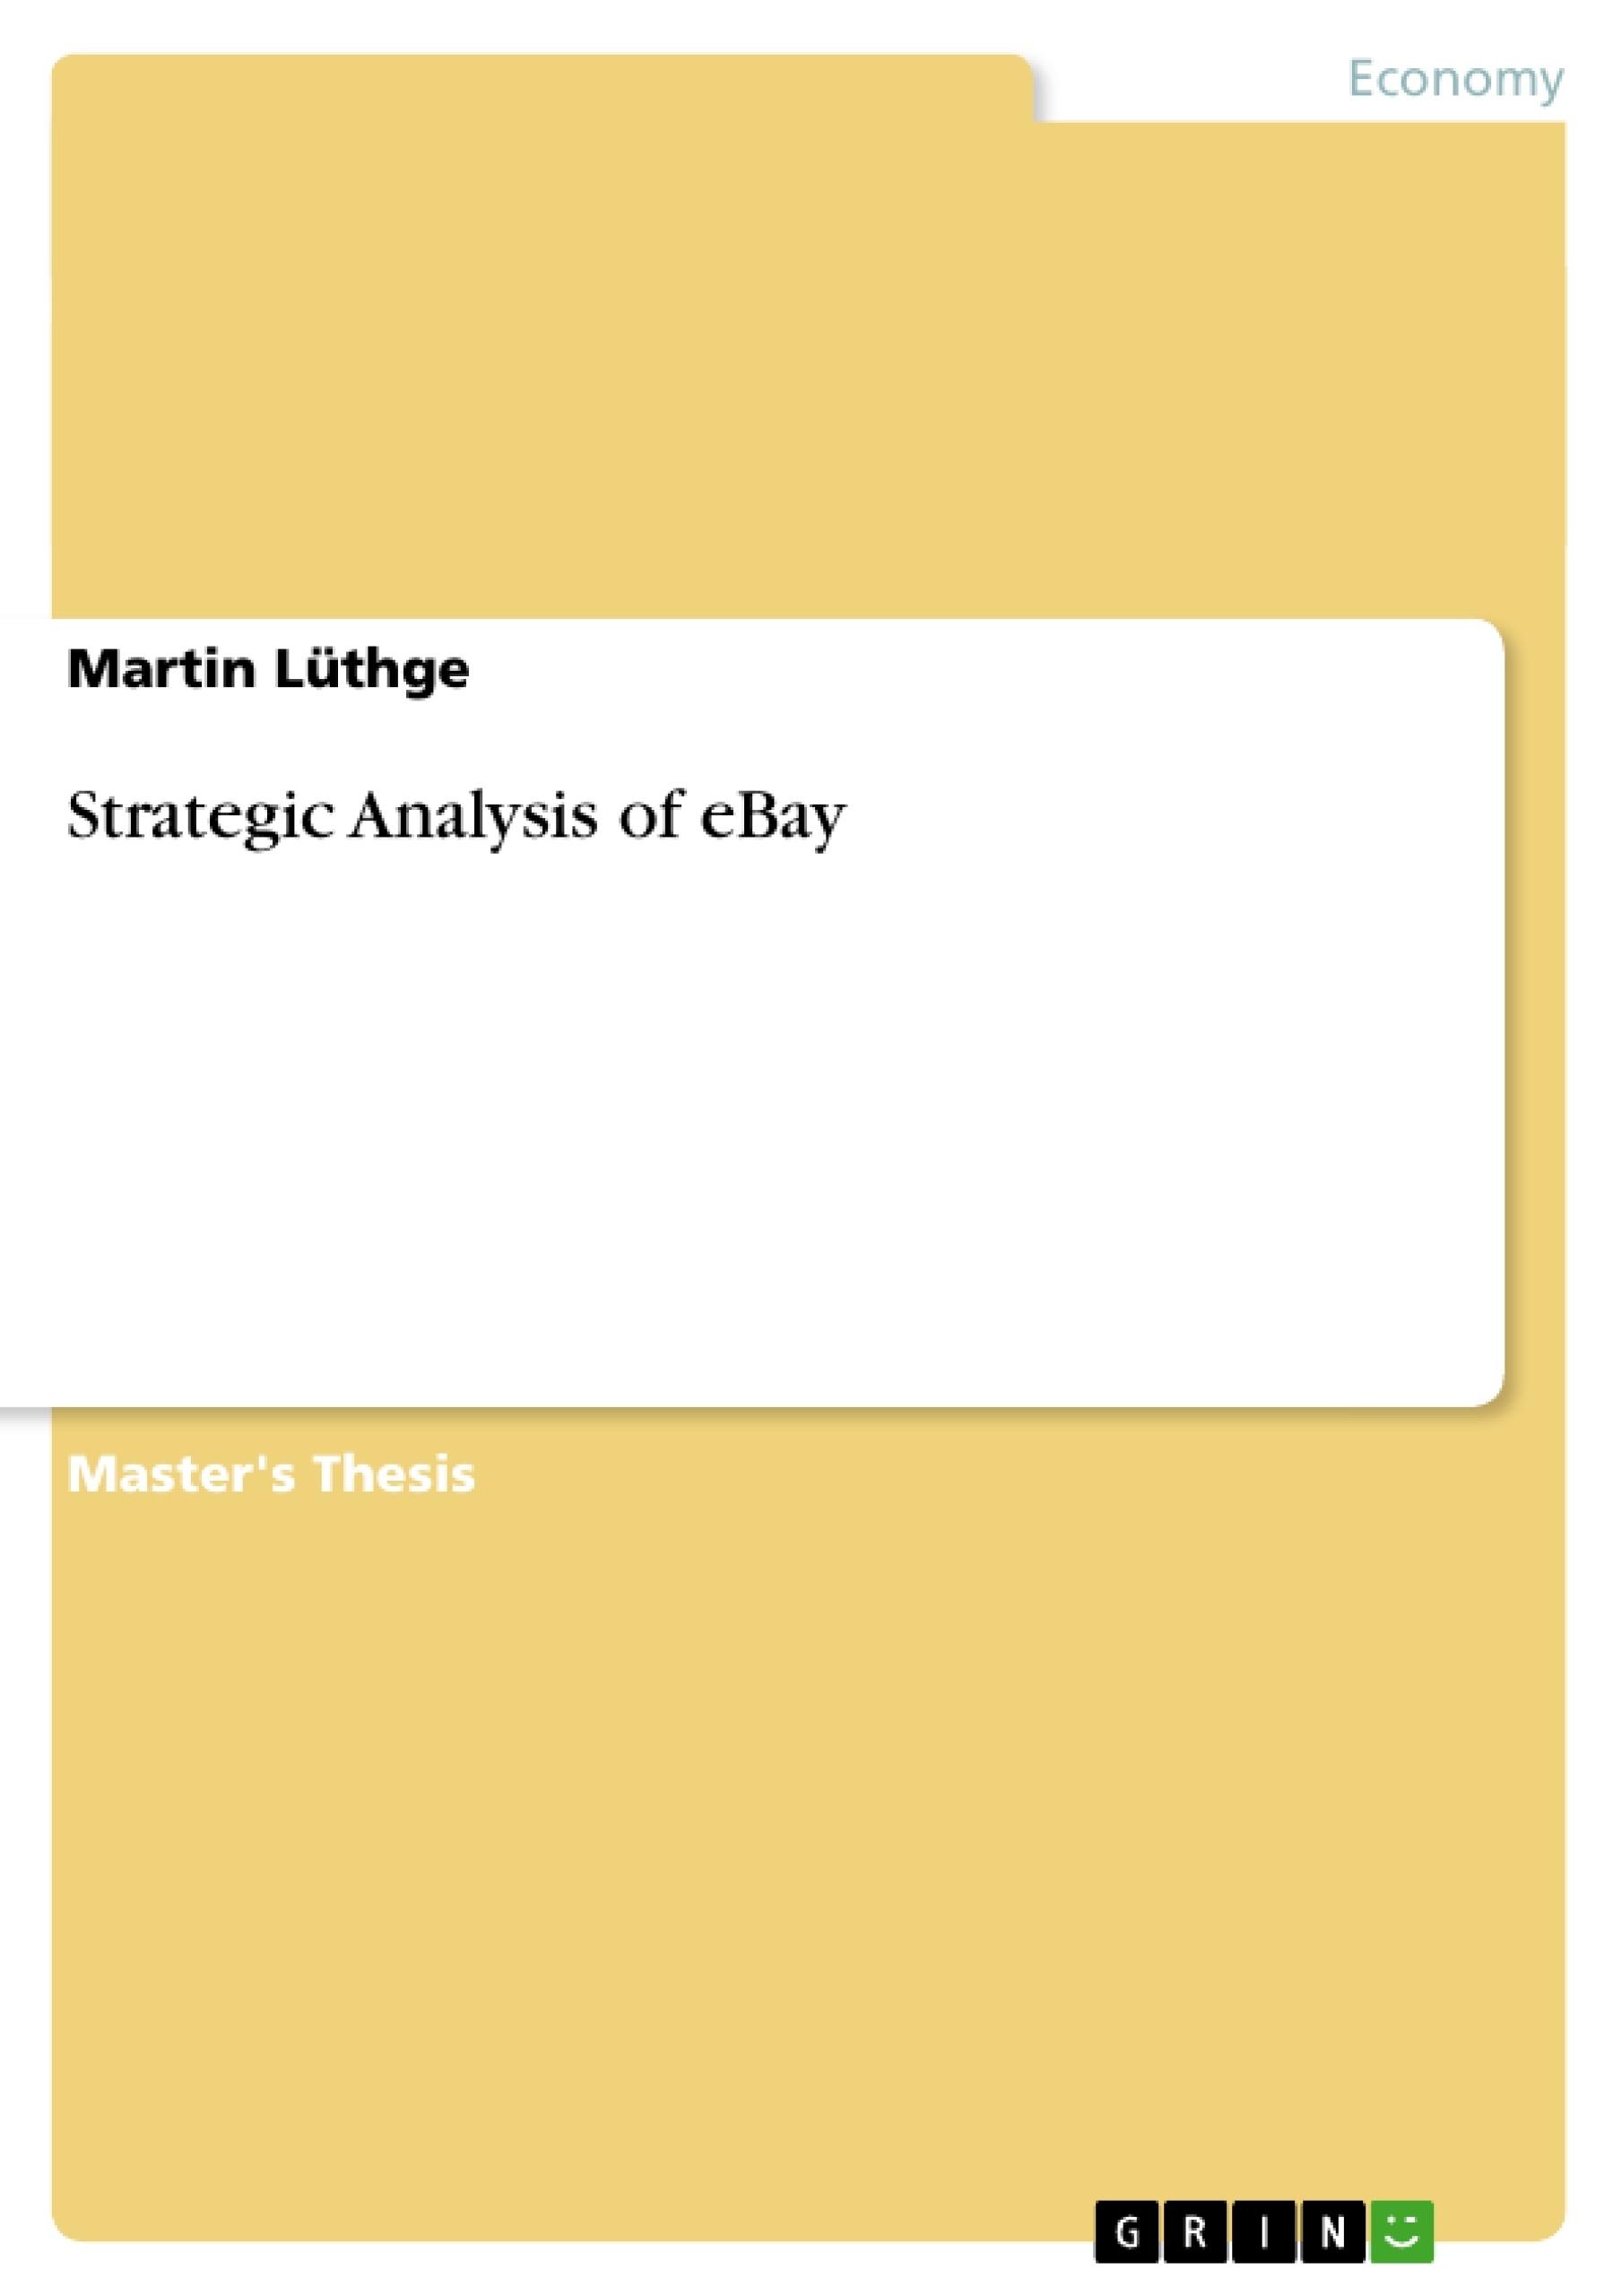 Title: Strategic Analysis of eBay